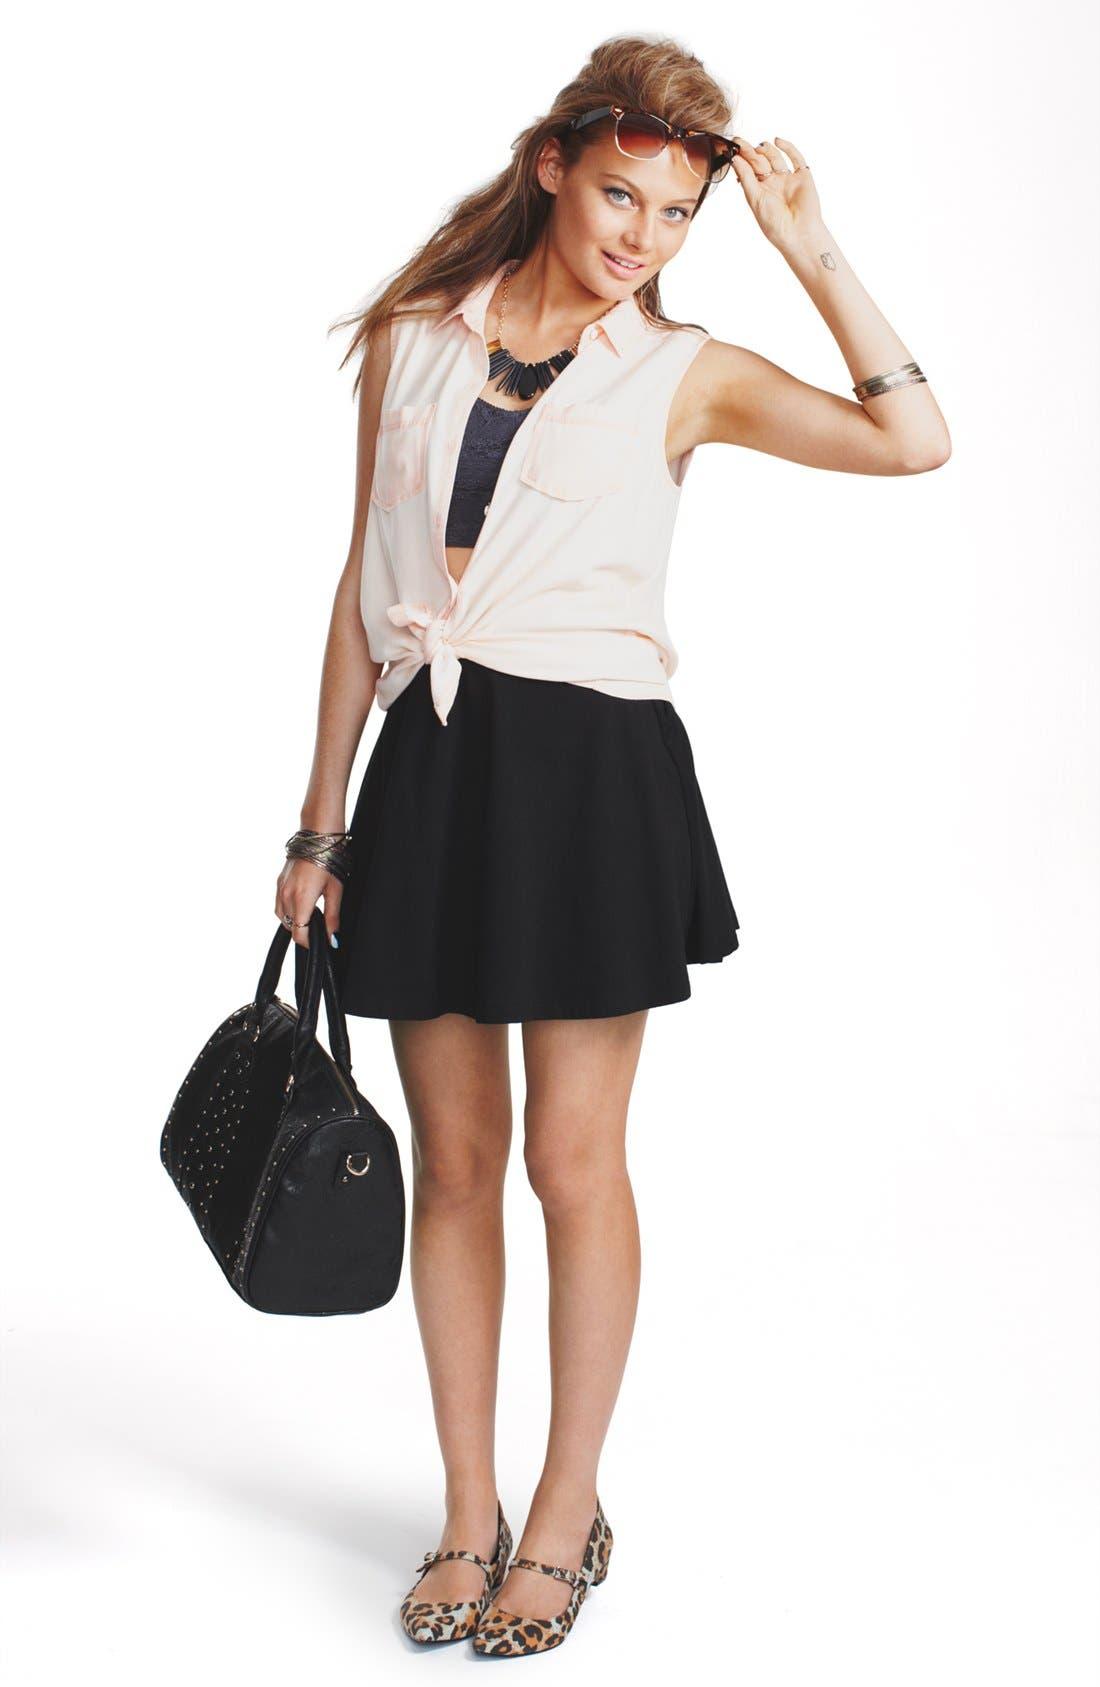 Main Image - Rubbish® Shirt, Frenchi® Bralette & Lily White Skater Skirt